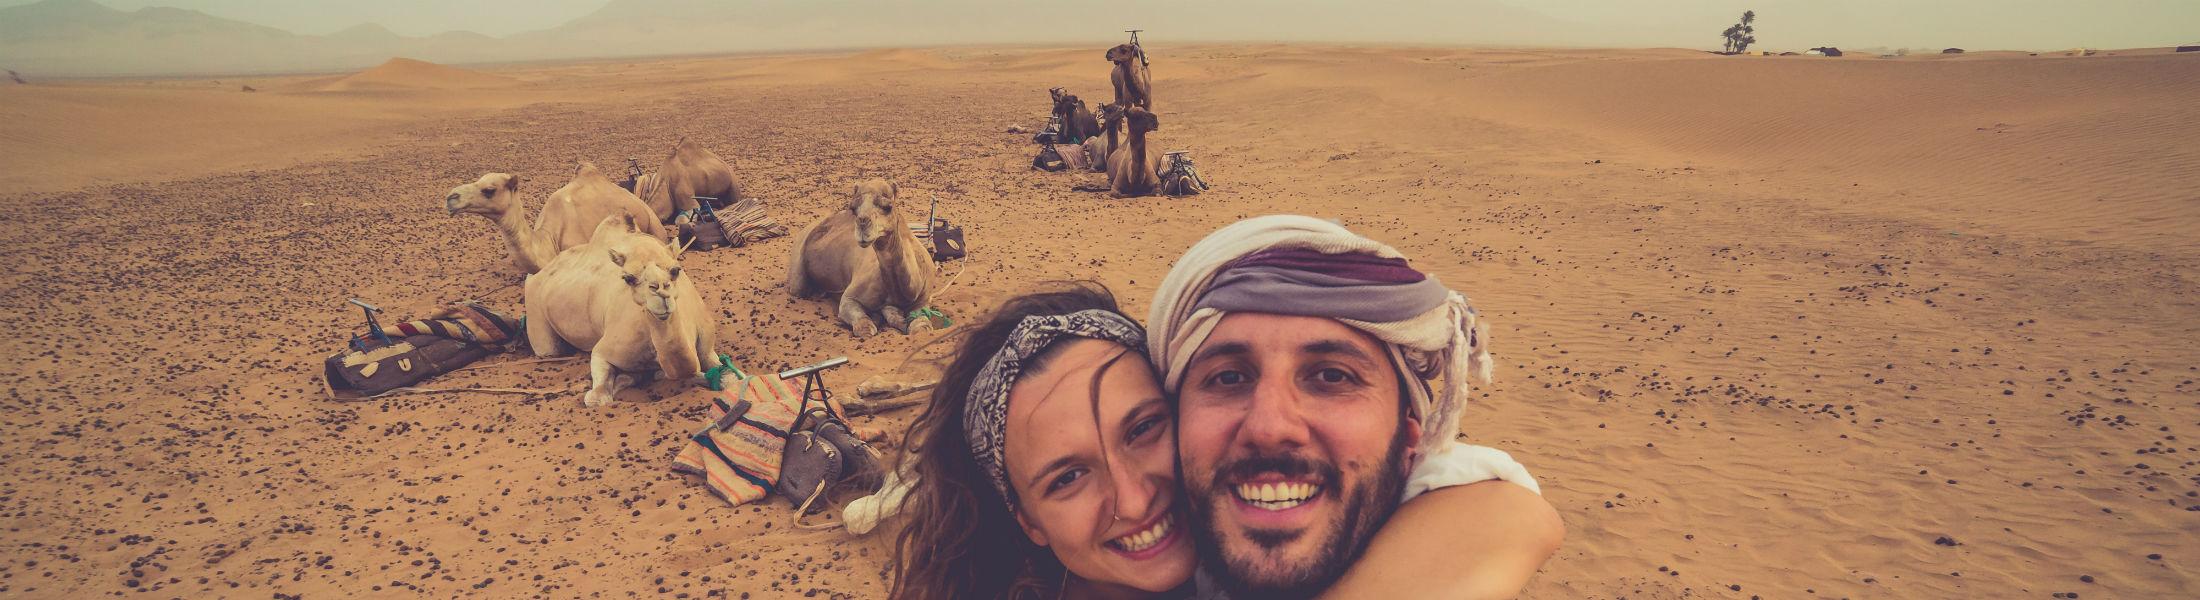 Couple enjoying safari desert